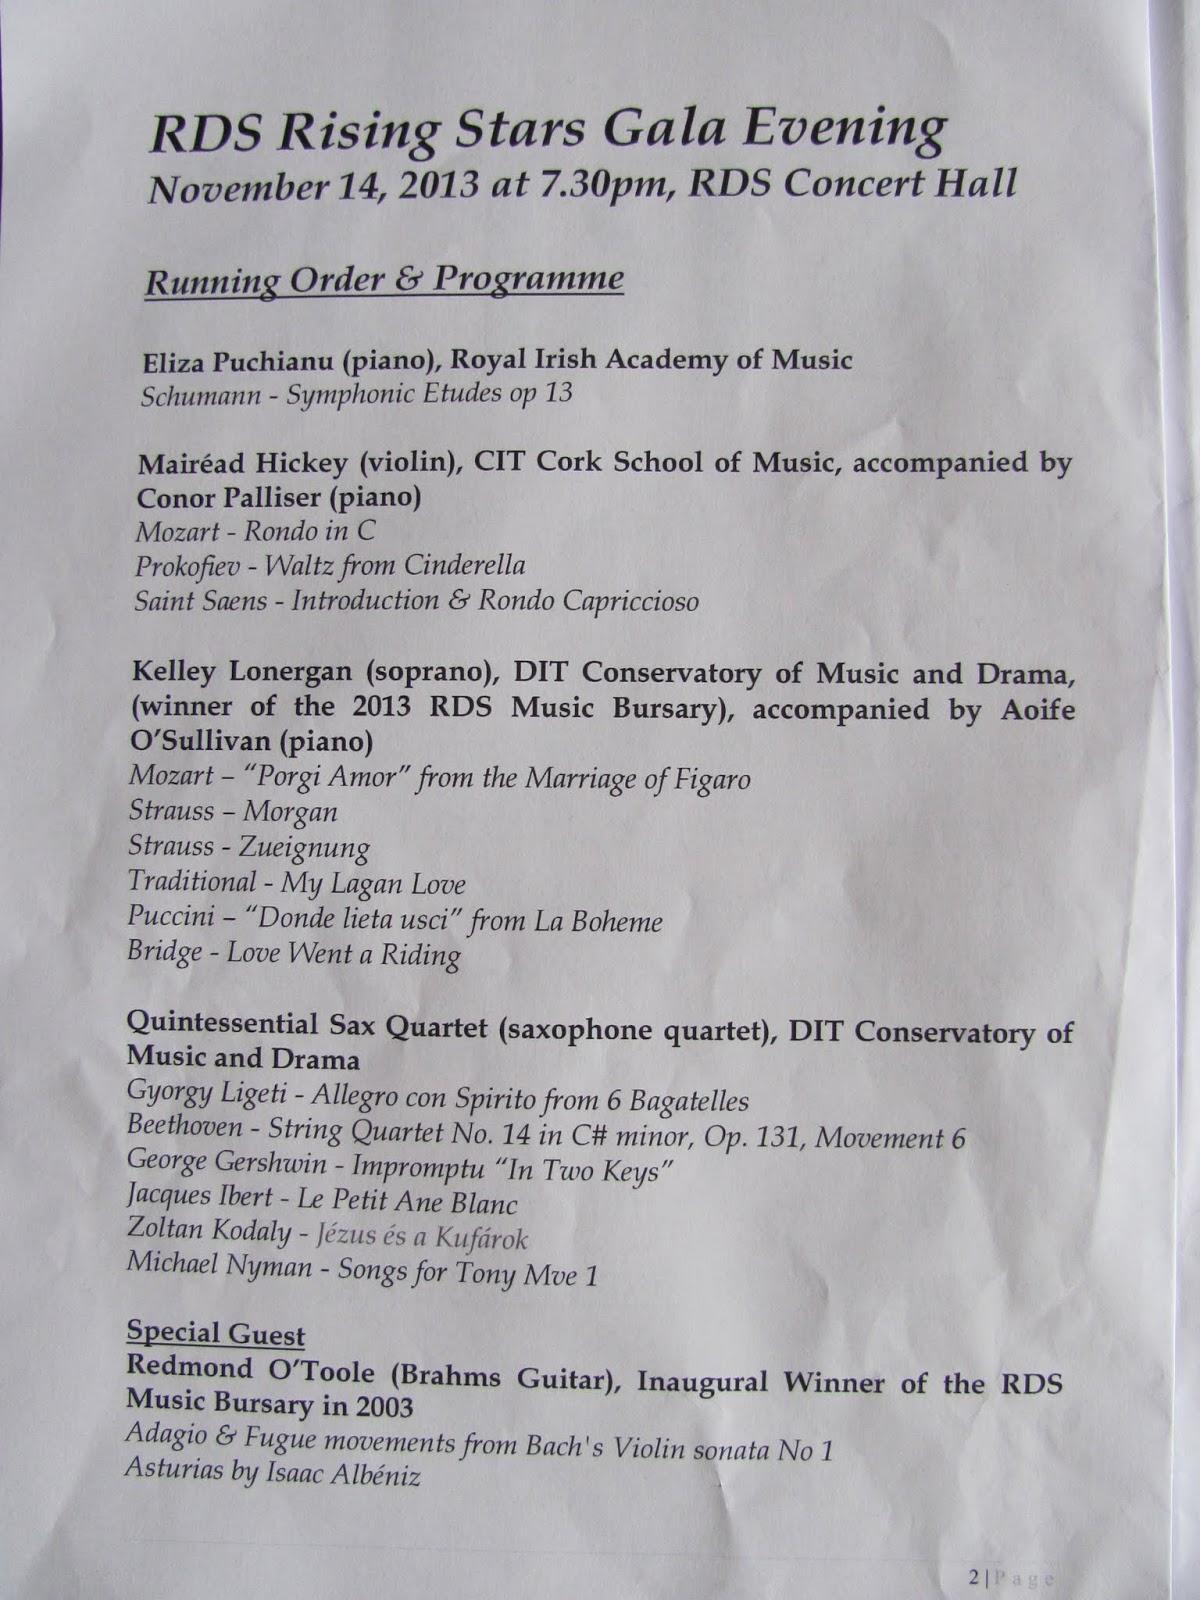 The Program(me) for RDS Rising Stars Gala Evening November 2013